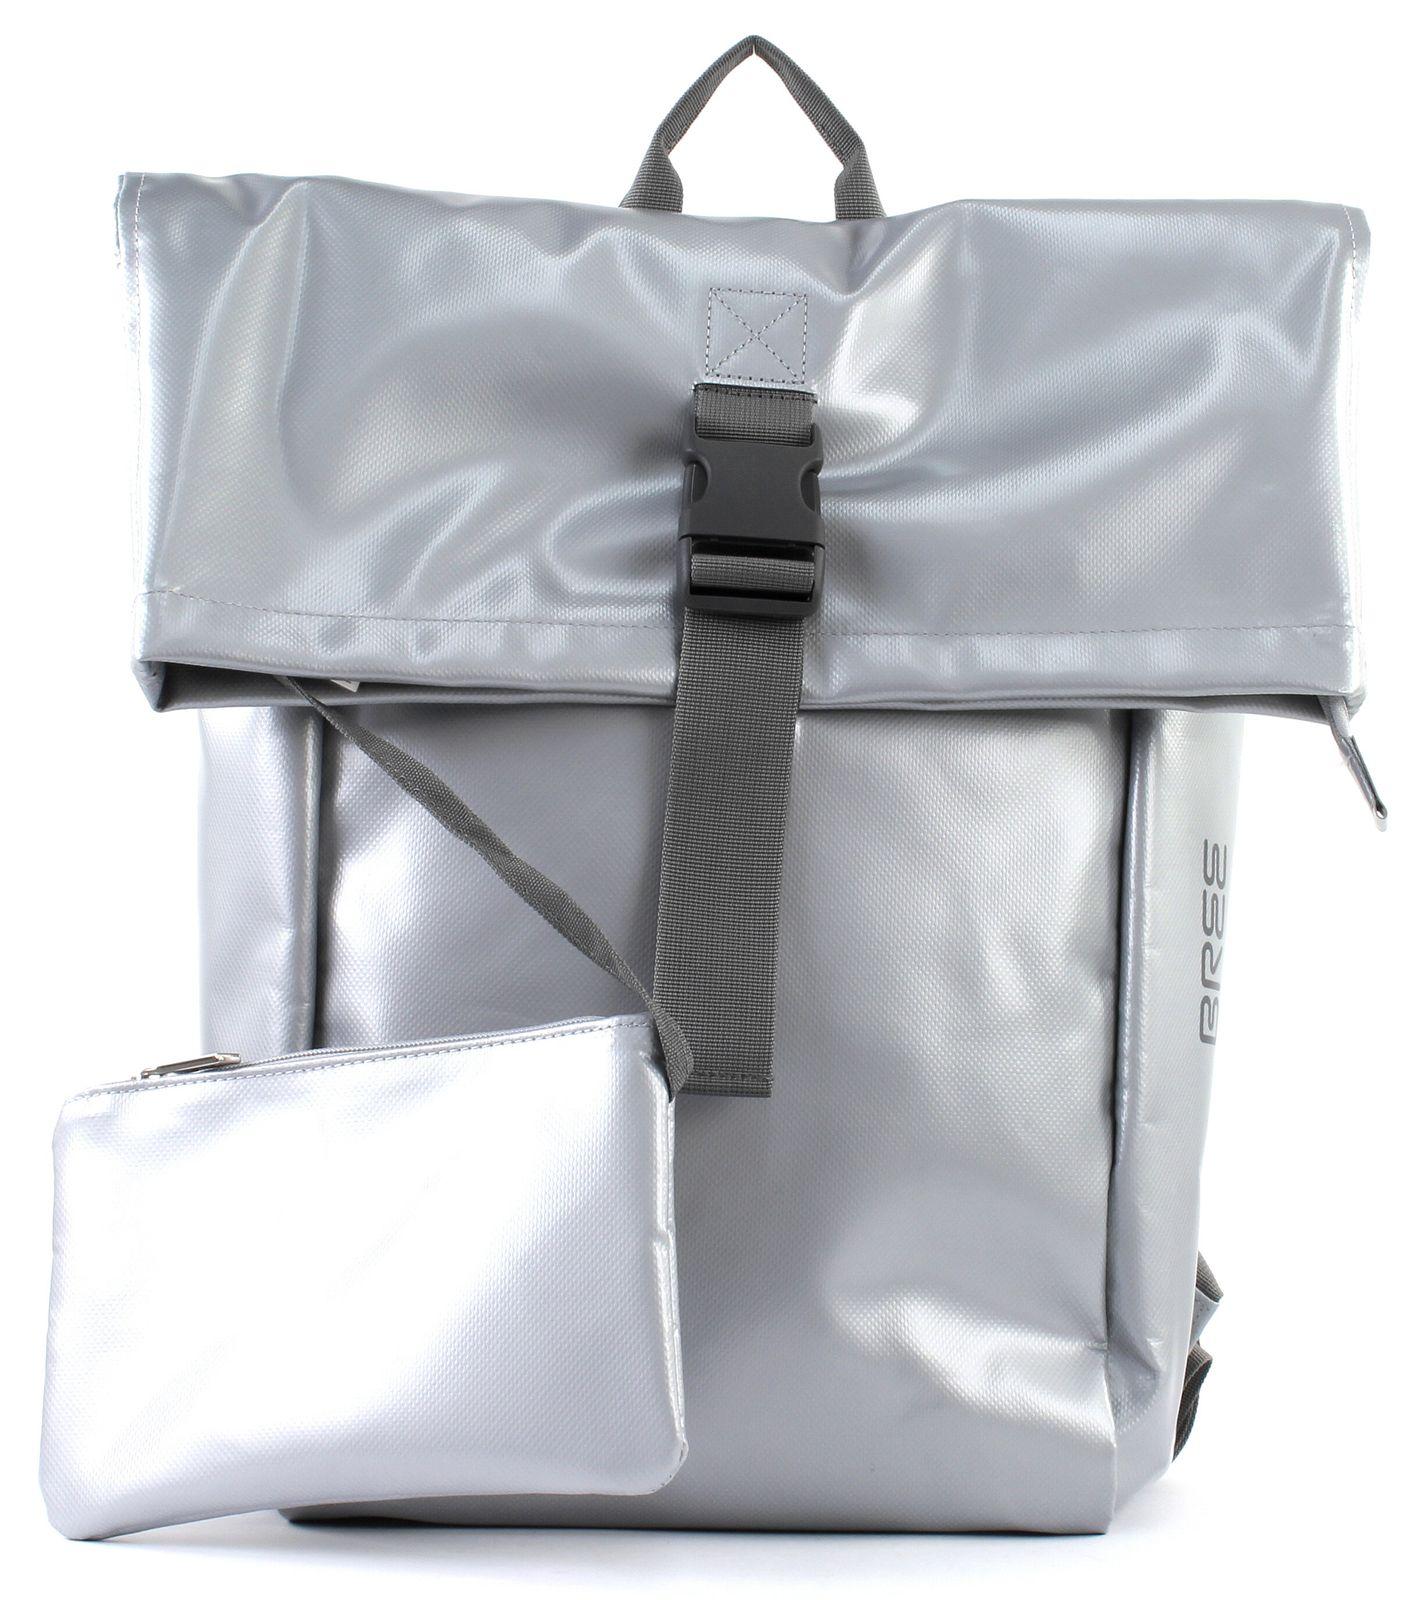 bree backpack punch 93 m shiny silver. Black Bedroom Furniture Sets. Home Design Ideas